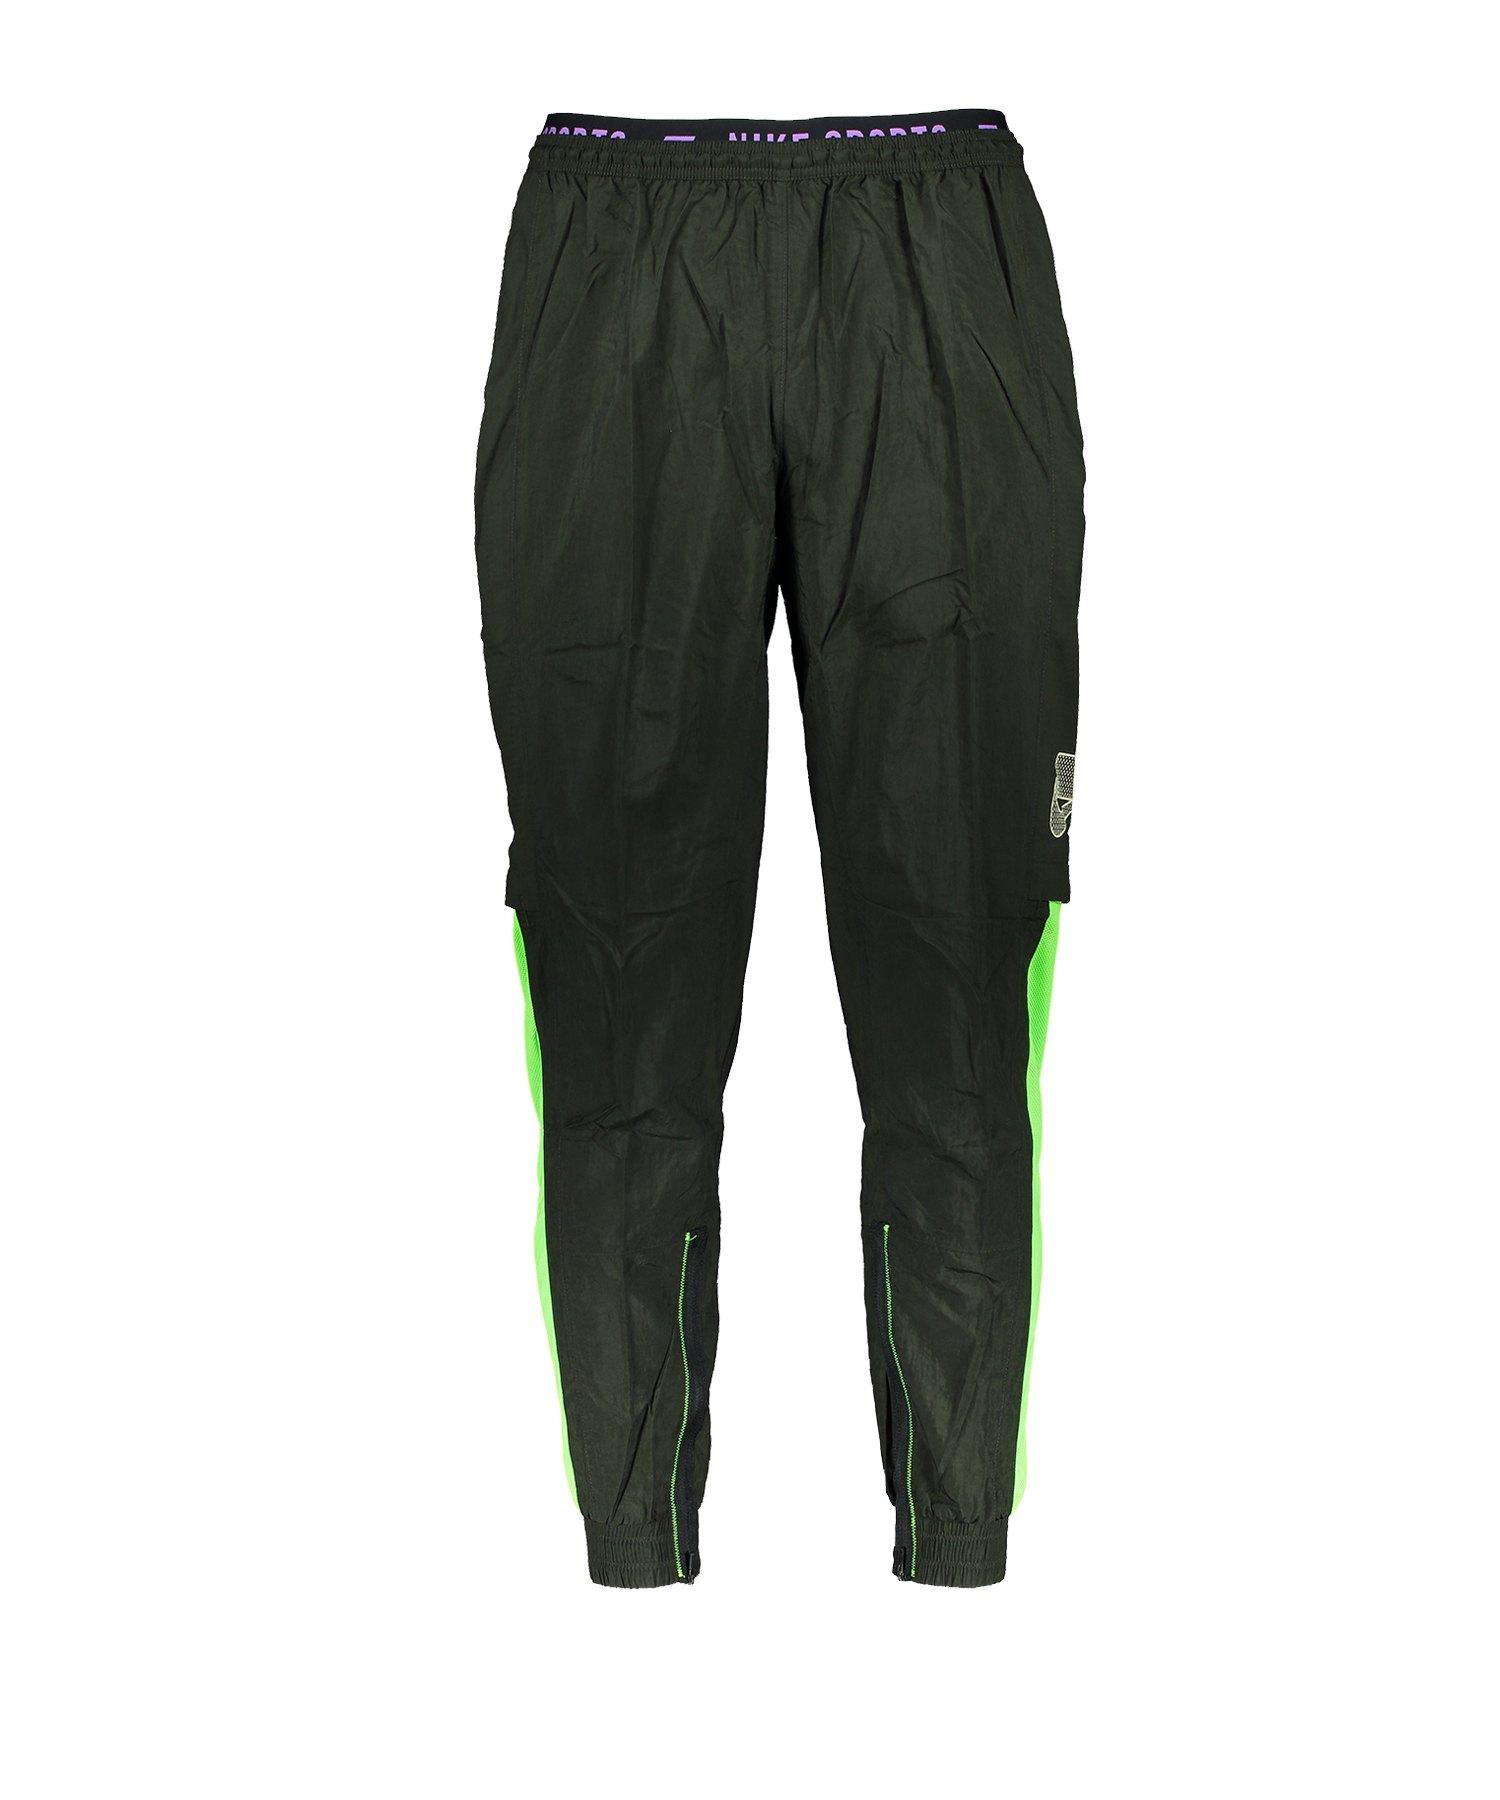 Nike 3-Season Pant Trainingshose Running Grün F355 - gruen